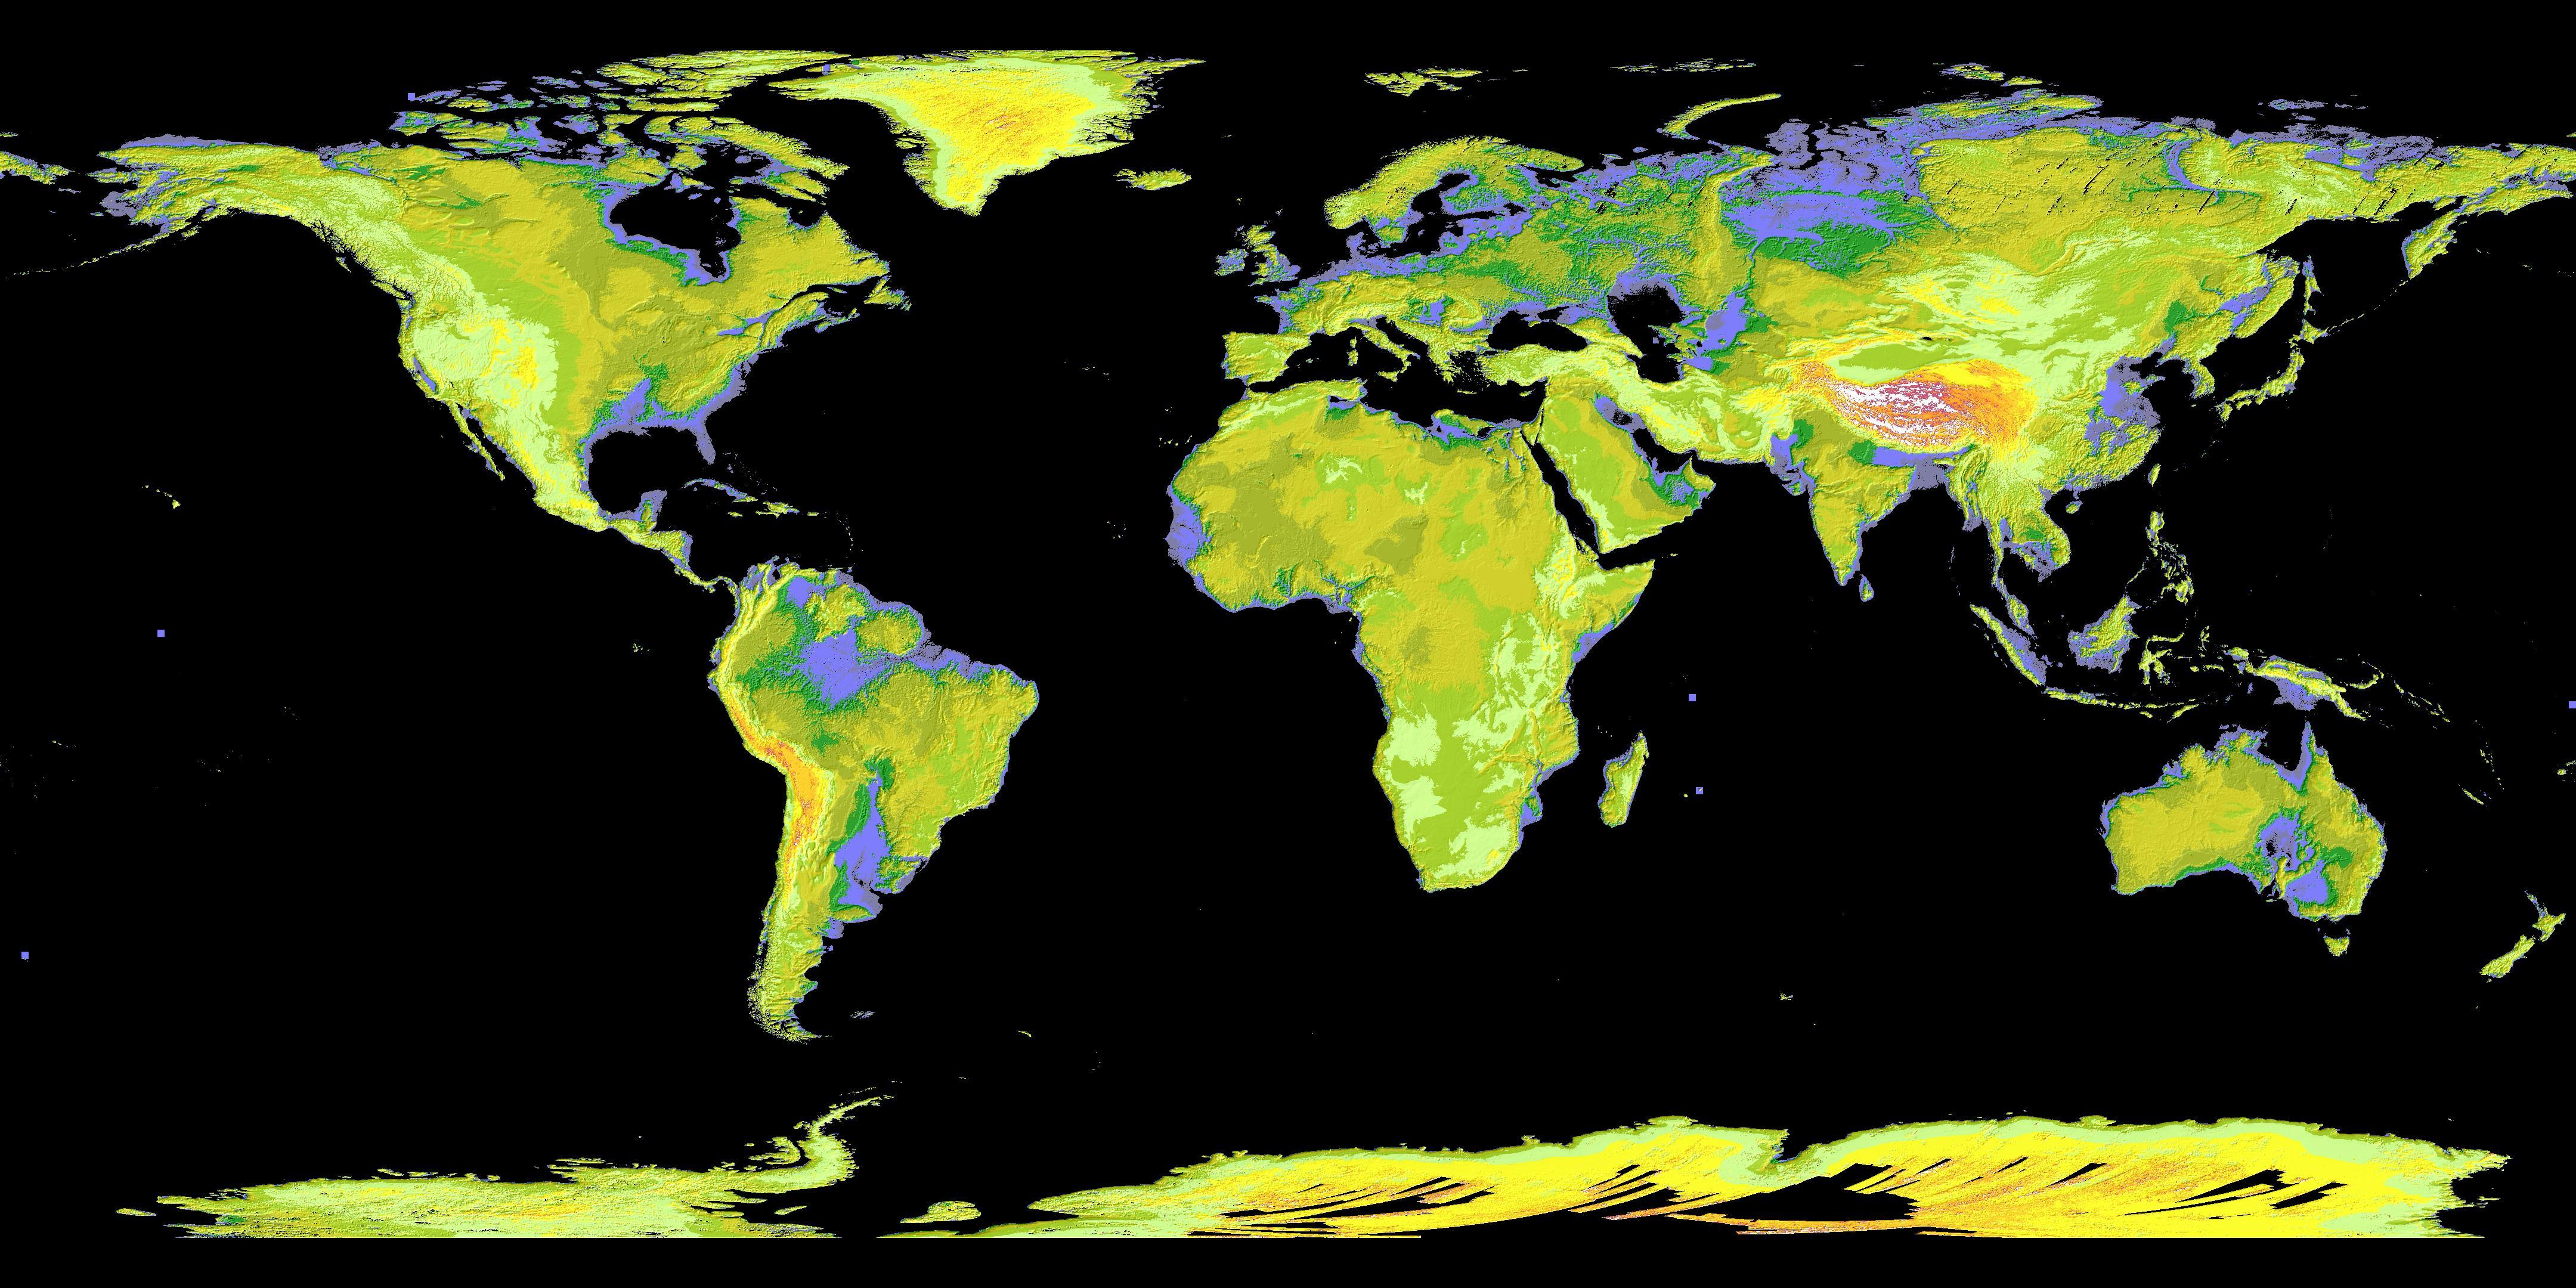 Space Images ASTER39s Global Digital Elevation